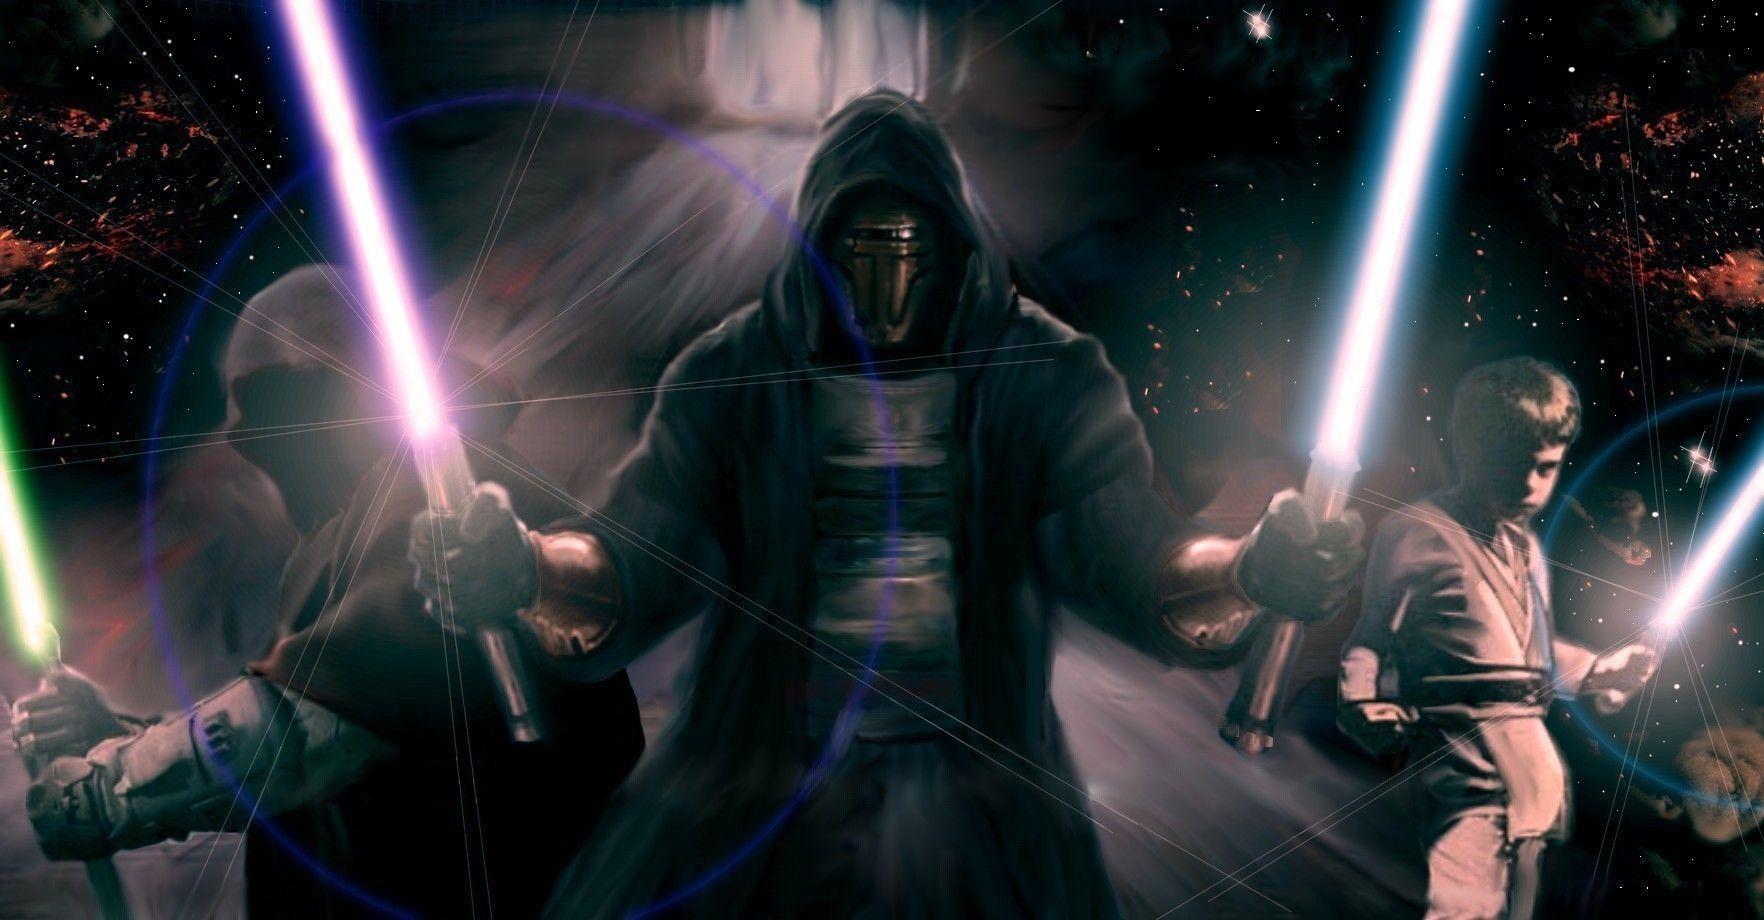 darth revan wallpaper - Google Search | Star Wars- Darth Revan ...